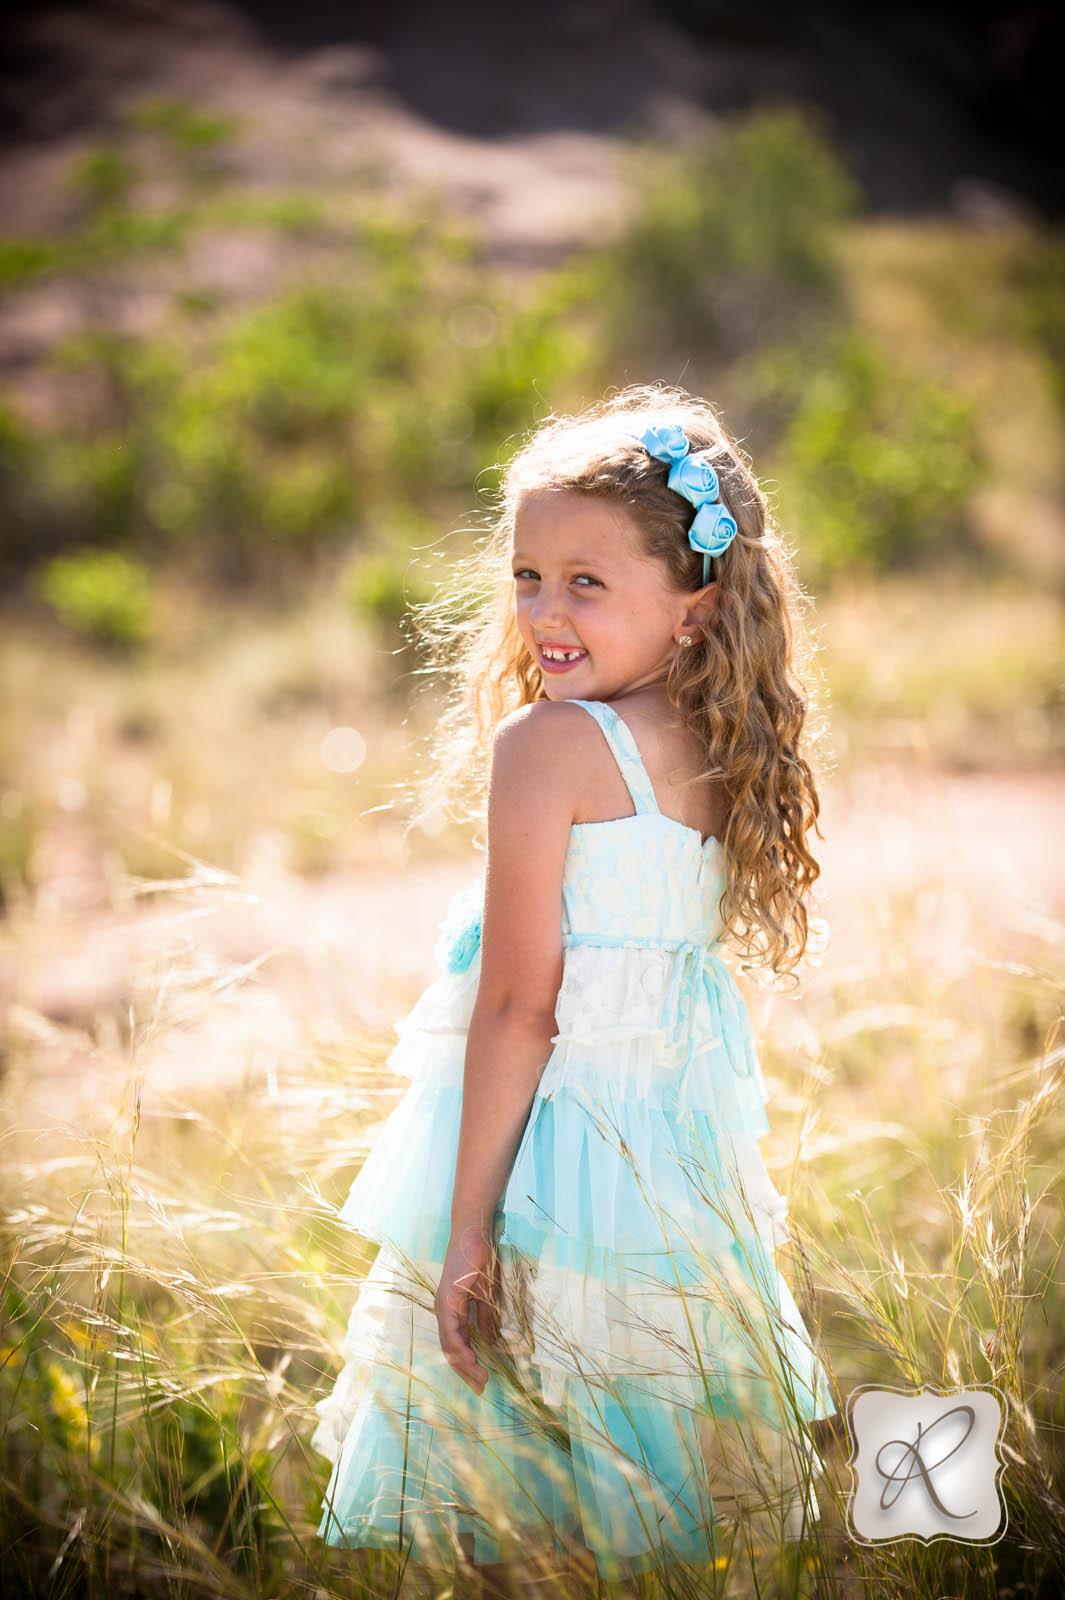 Children For Daz Studio And Poser: Kids Portraits